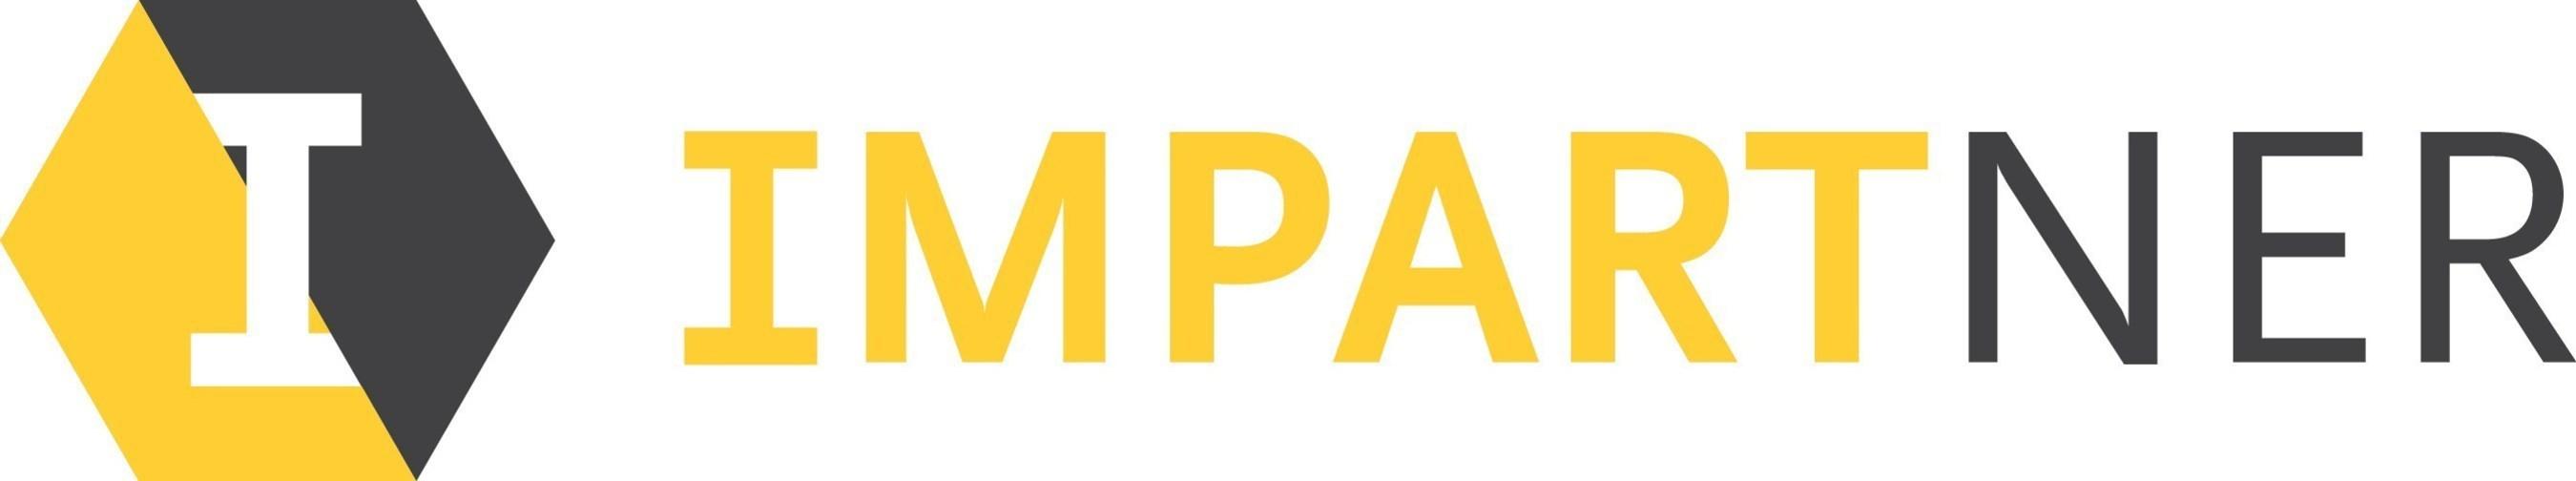 Impartner Powers Global Partner Portal for Workfront, the SaaS leader in Marketing Work Management